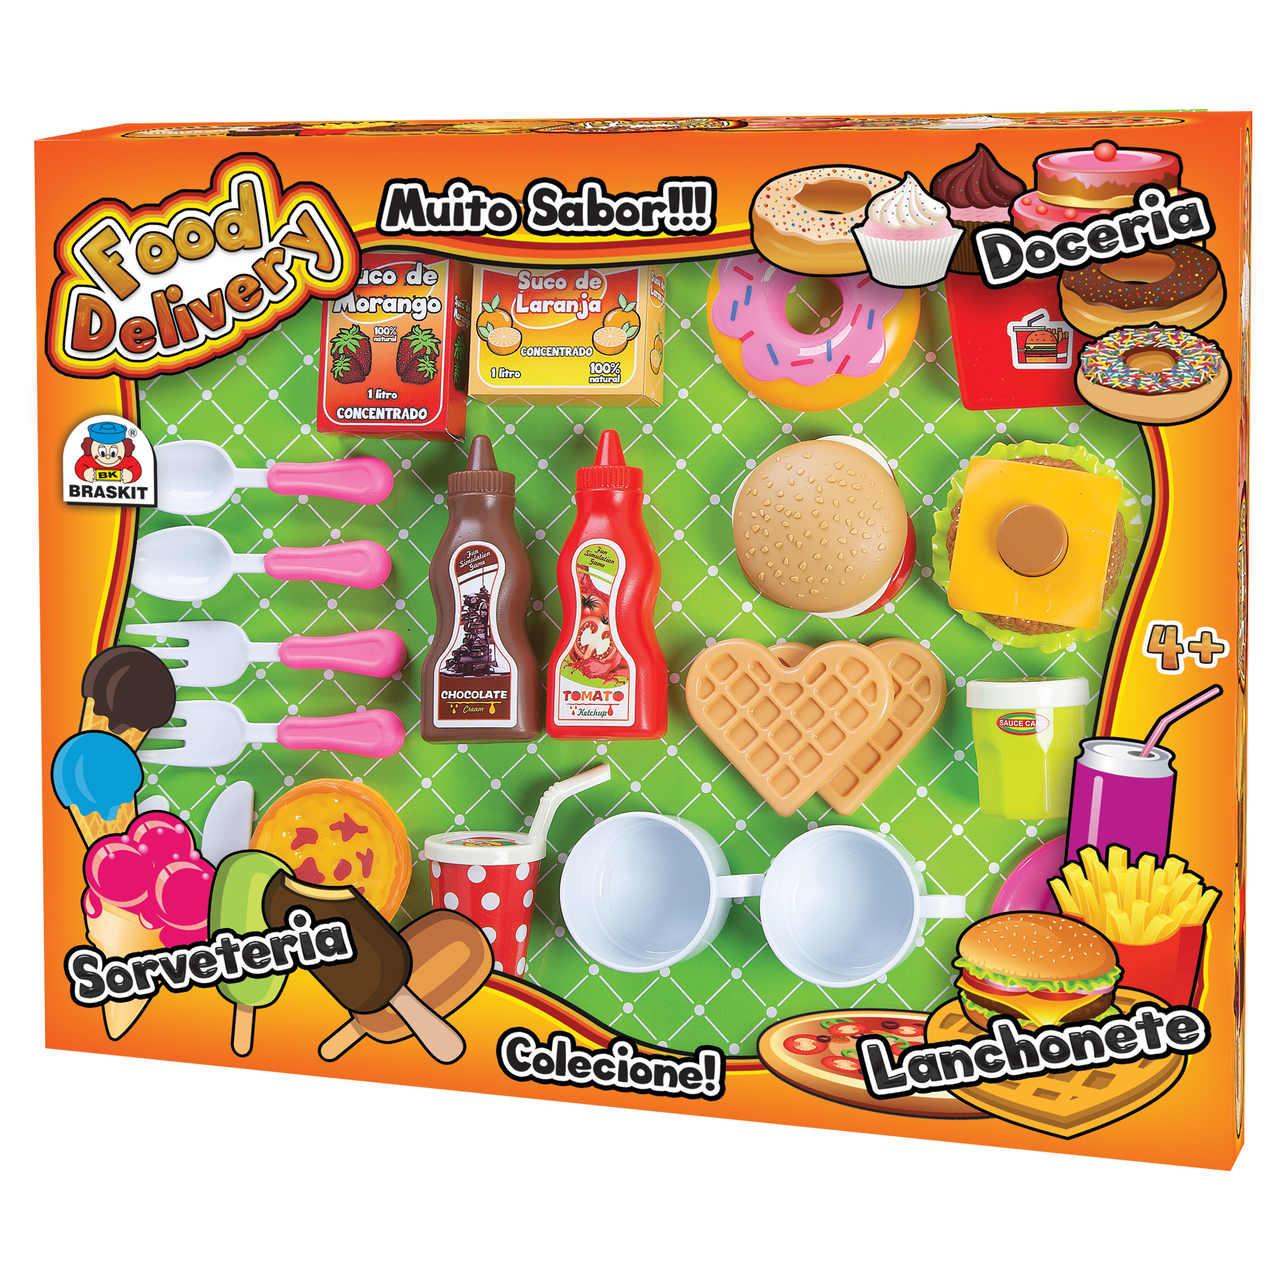 Cozinha Infantil Food Delivery Lanchonete Doceria Sorveteria